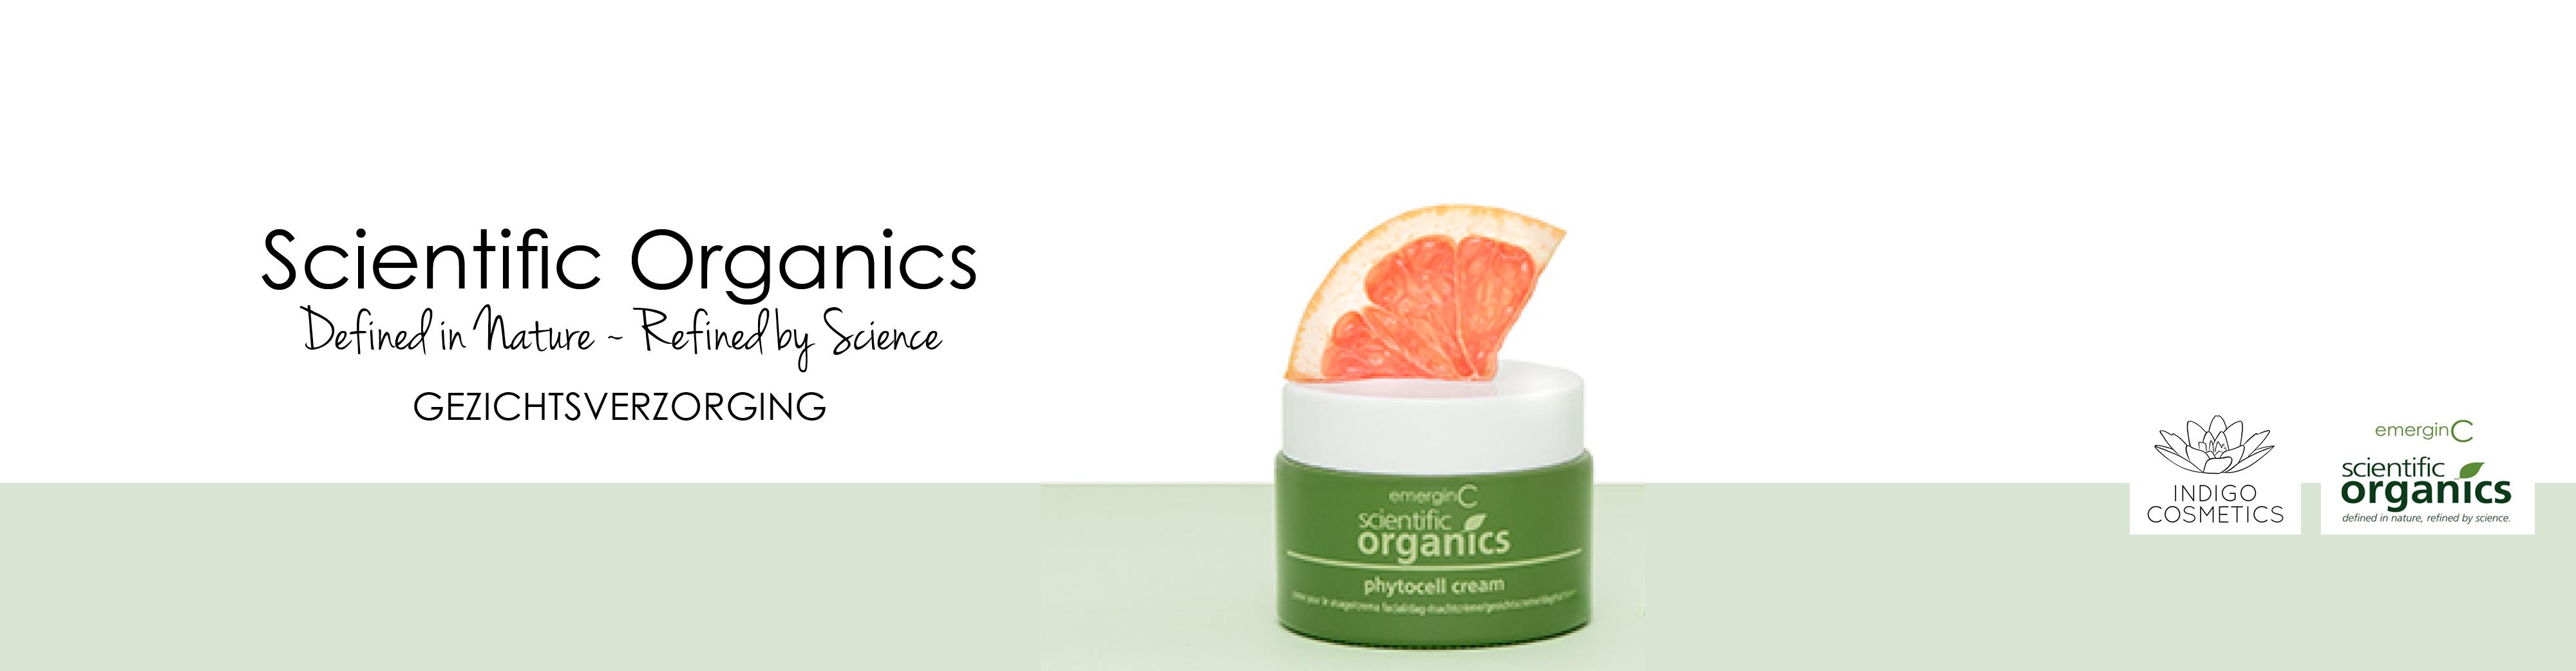 organic-gezichtsverzorging